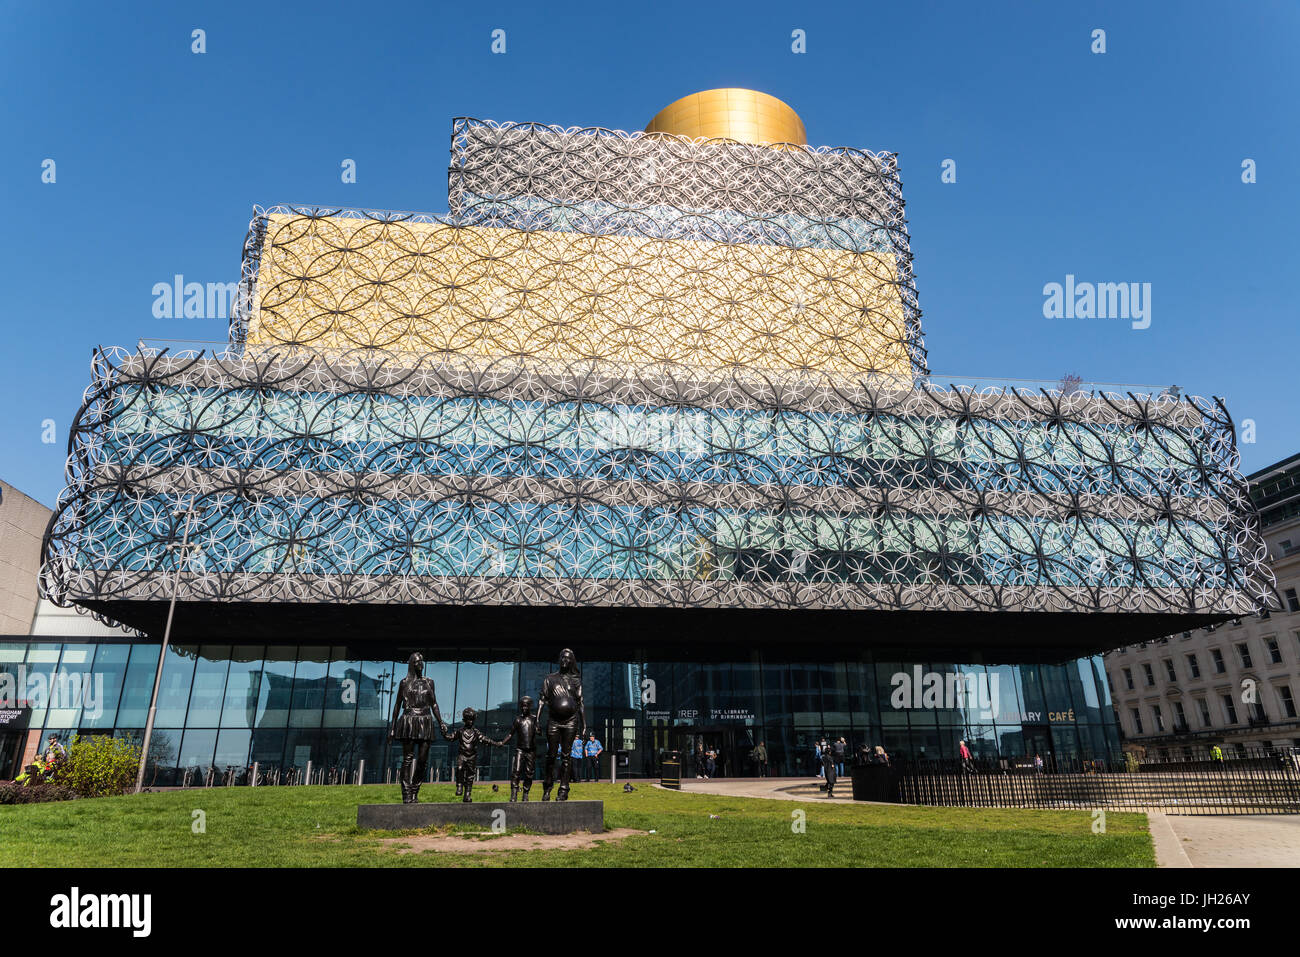 La biblioteca de Birmingham, una biblioteca pública en Birmingham, Inglaterra, Reino Unido, Europa Imagen De Stock